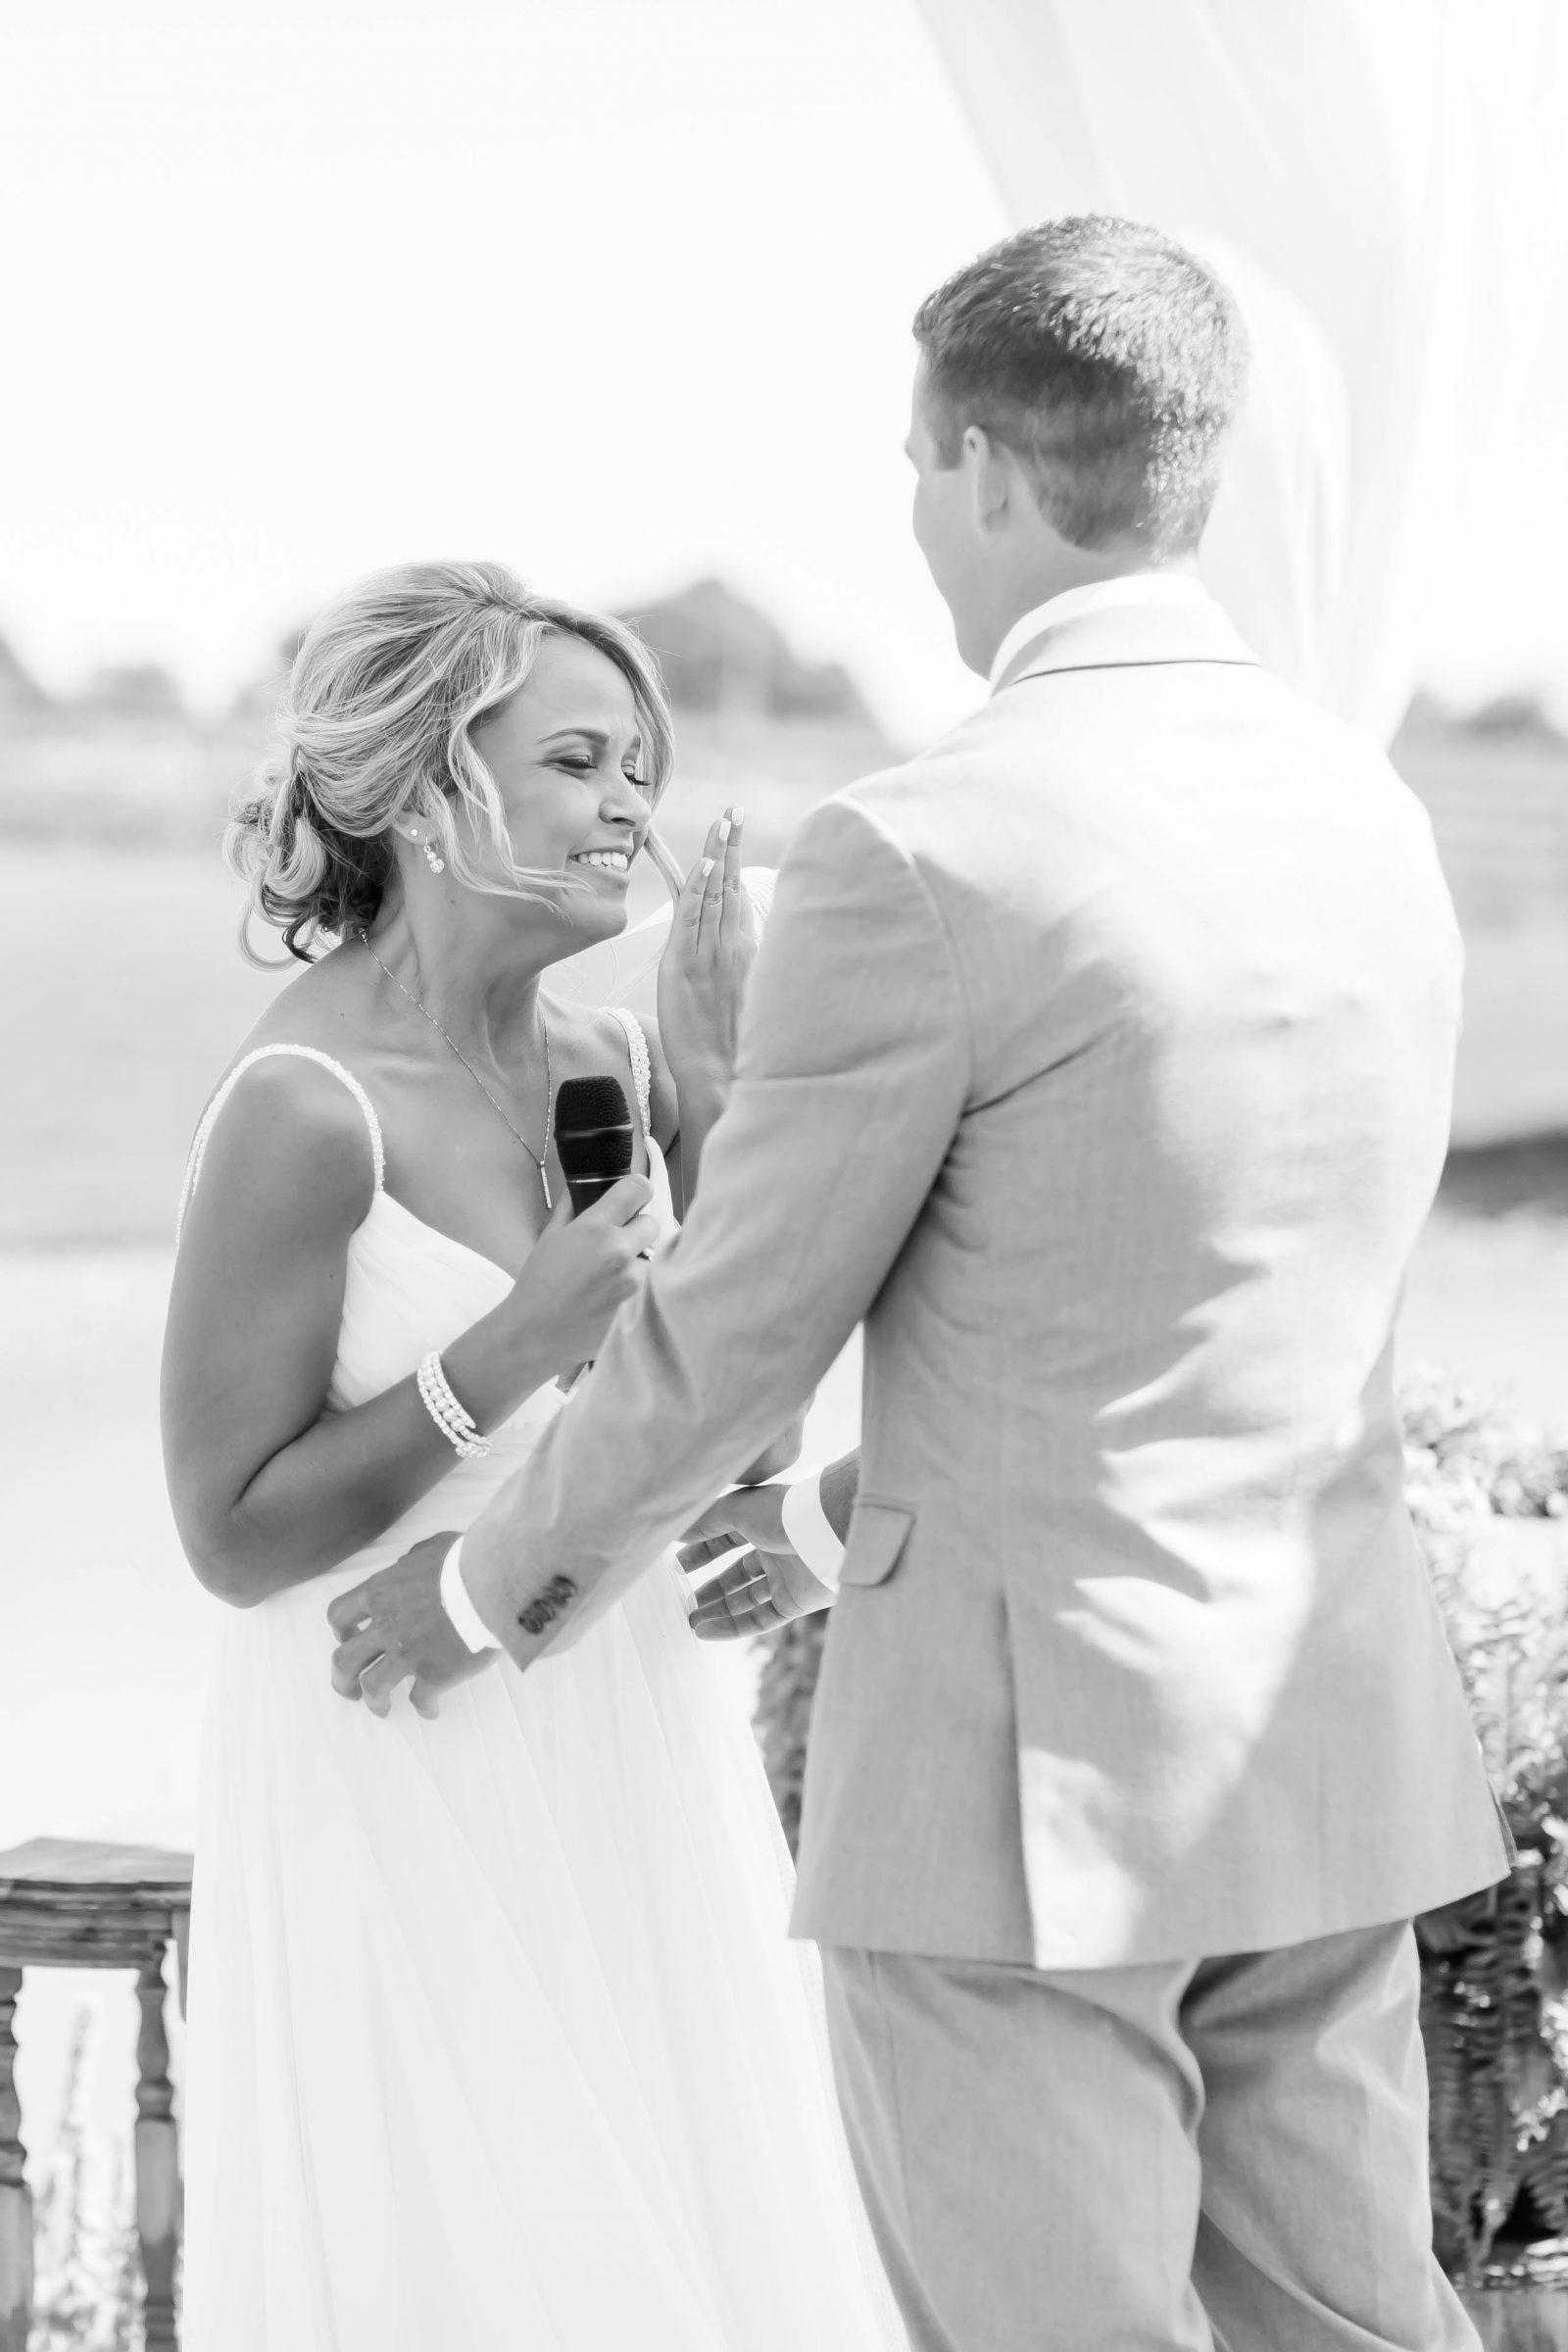 peacock-ridge-summer-wedding-photographer-akron-ohio-loren-jackson-photography-75